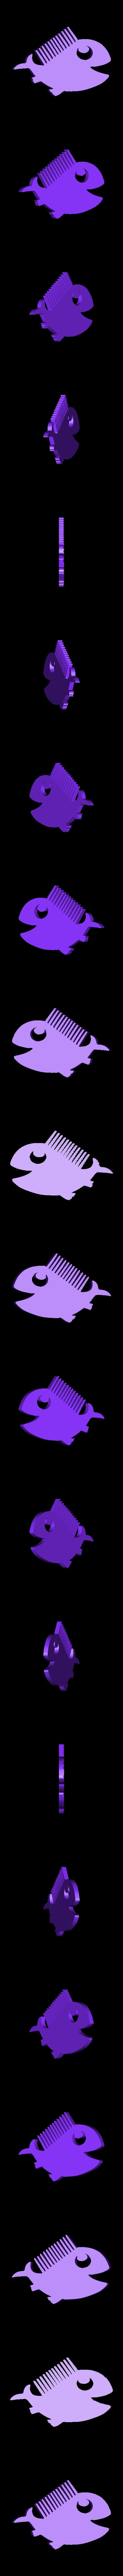 Fish.stl Download free STL file Fantasy combs ocean - Fantasy combs ocean • Design to 3D print, Julien_DaCosta